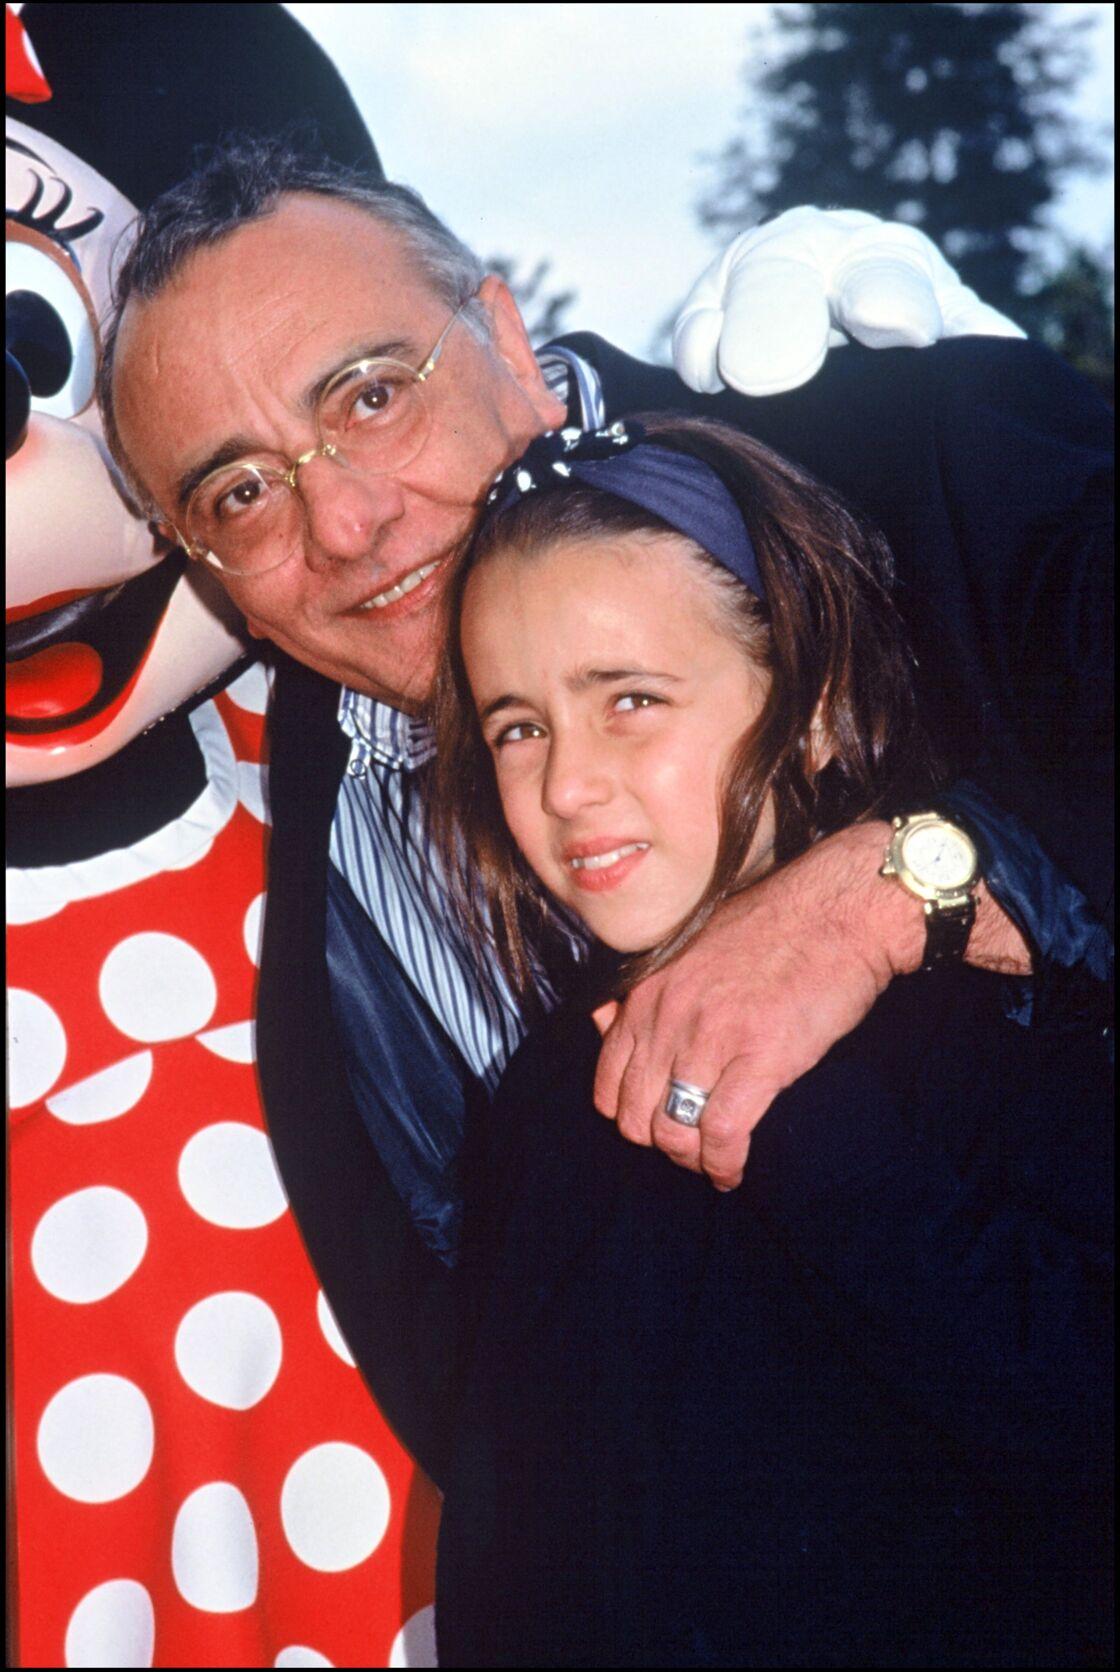 Yves Mourousi, un papa poule pour sa fille Sophie (ici, en 1997 à Eurodisney)